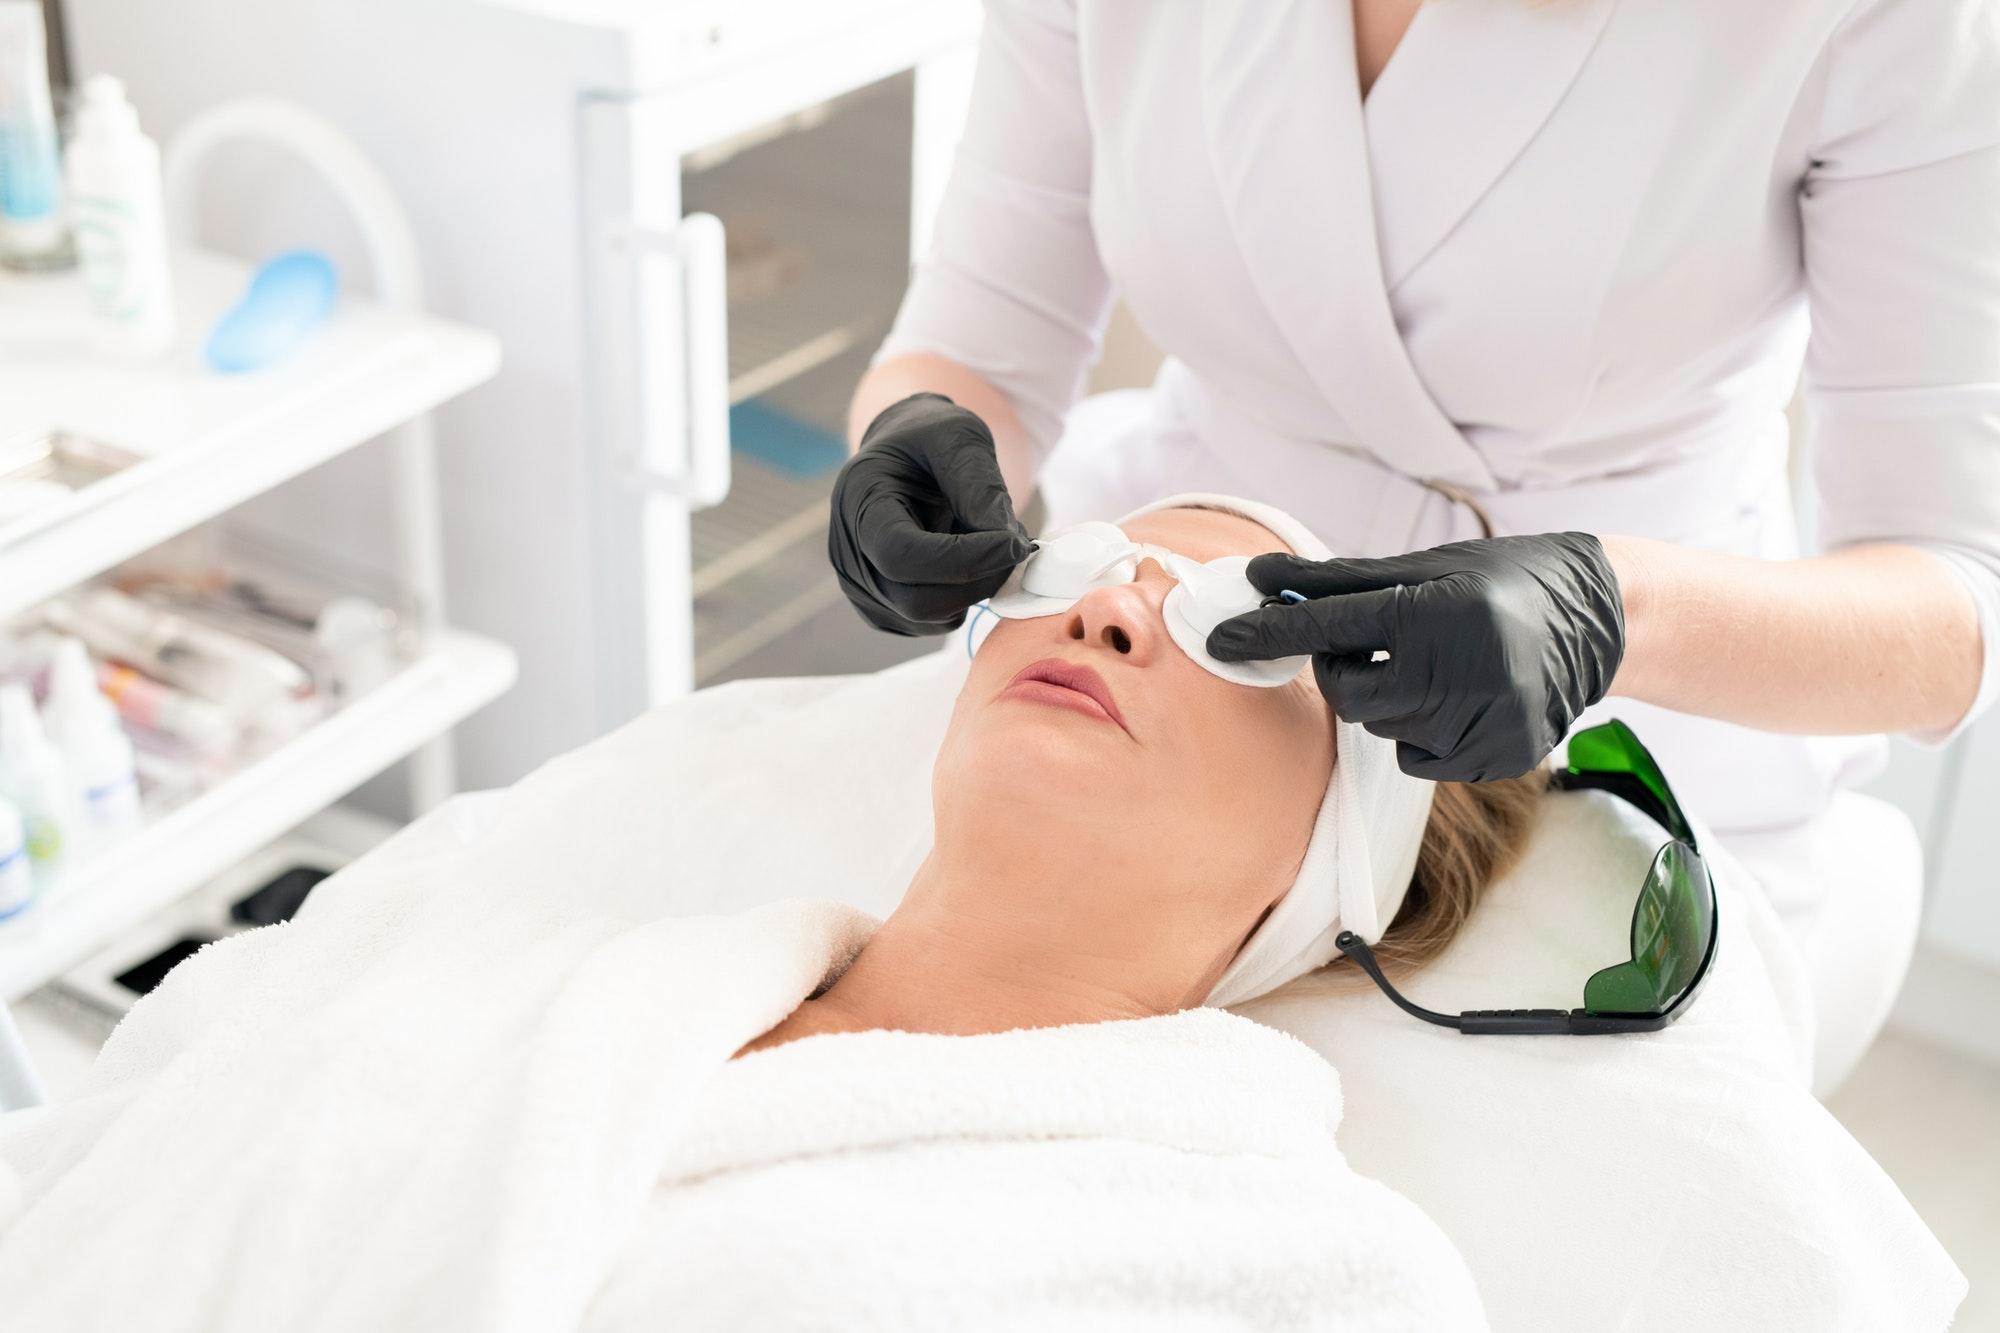 Preparing client for laser surgery